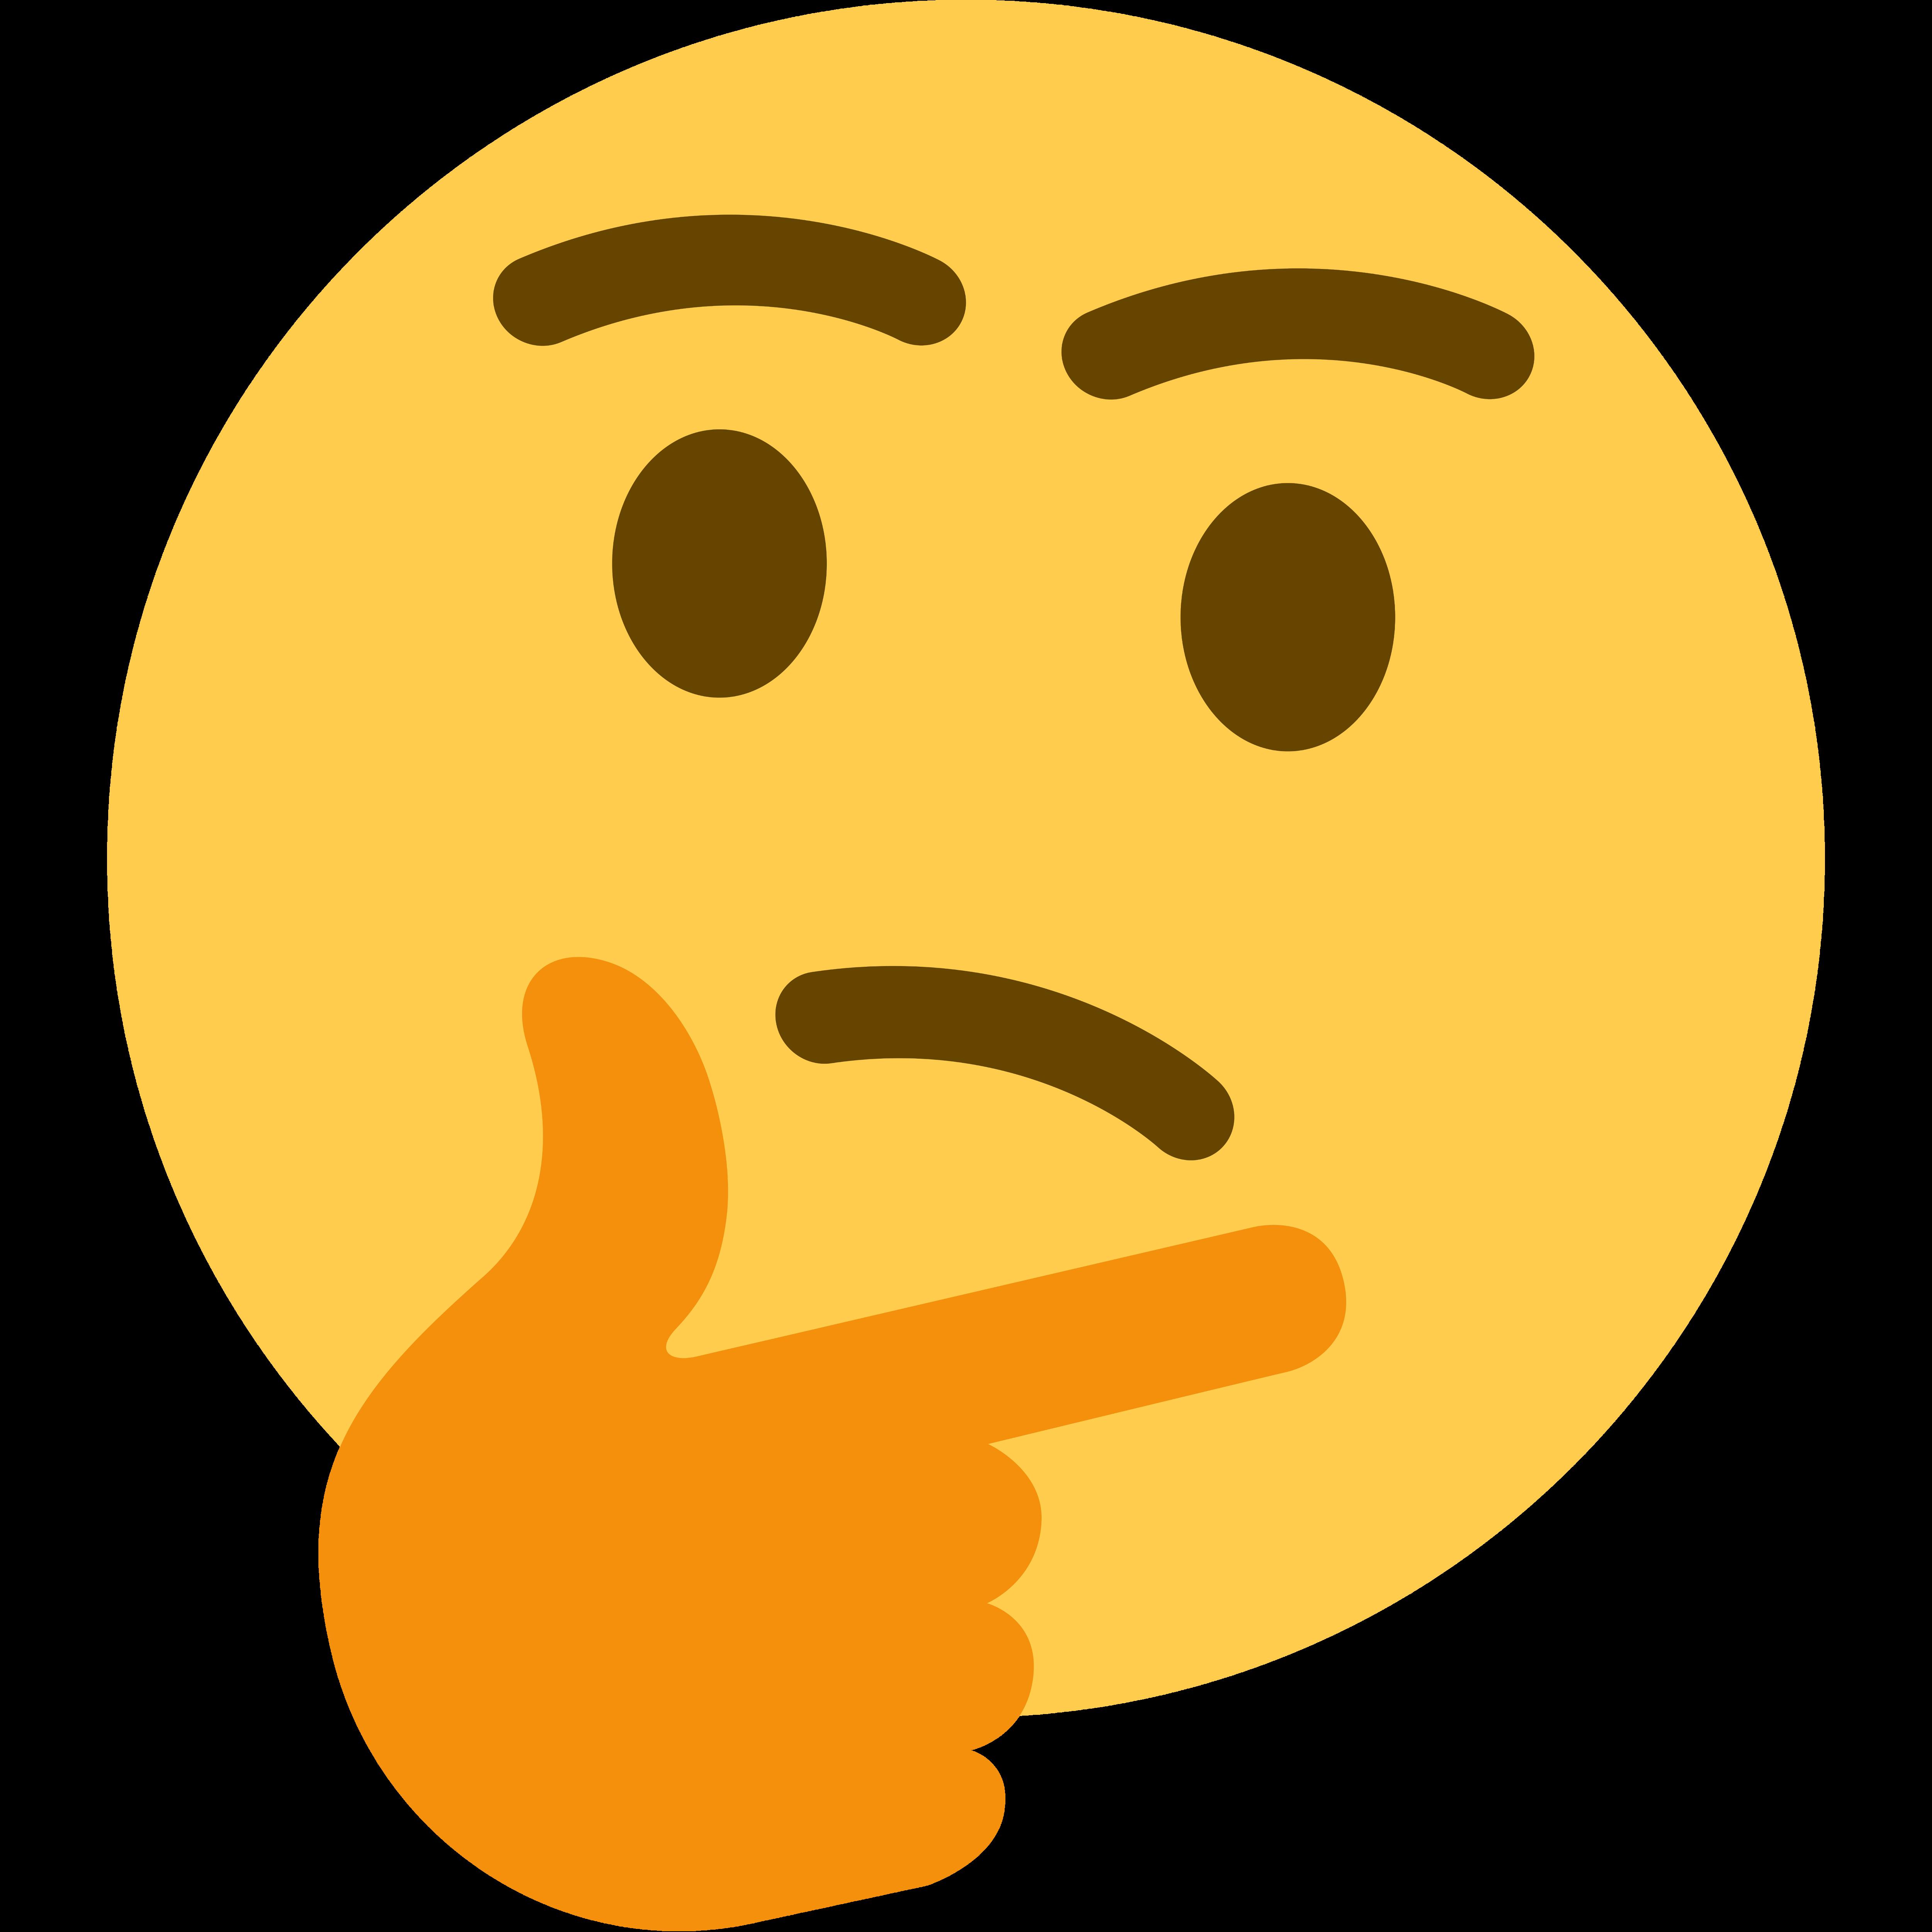 Emoji Thought Clip art.